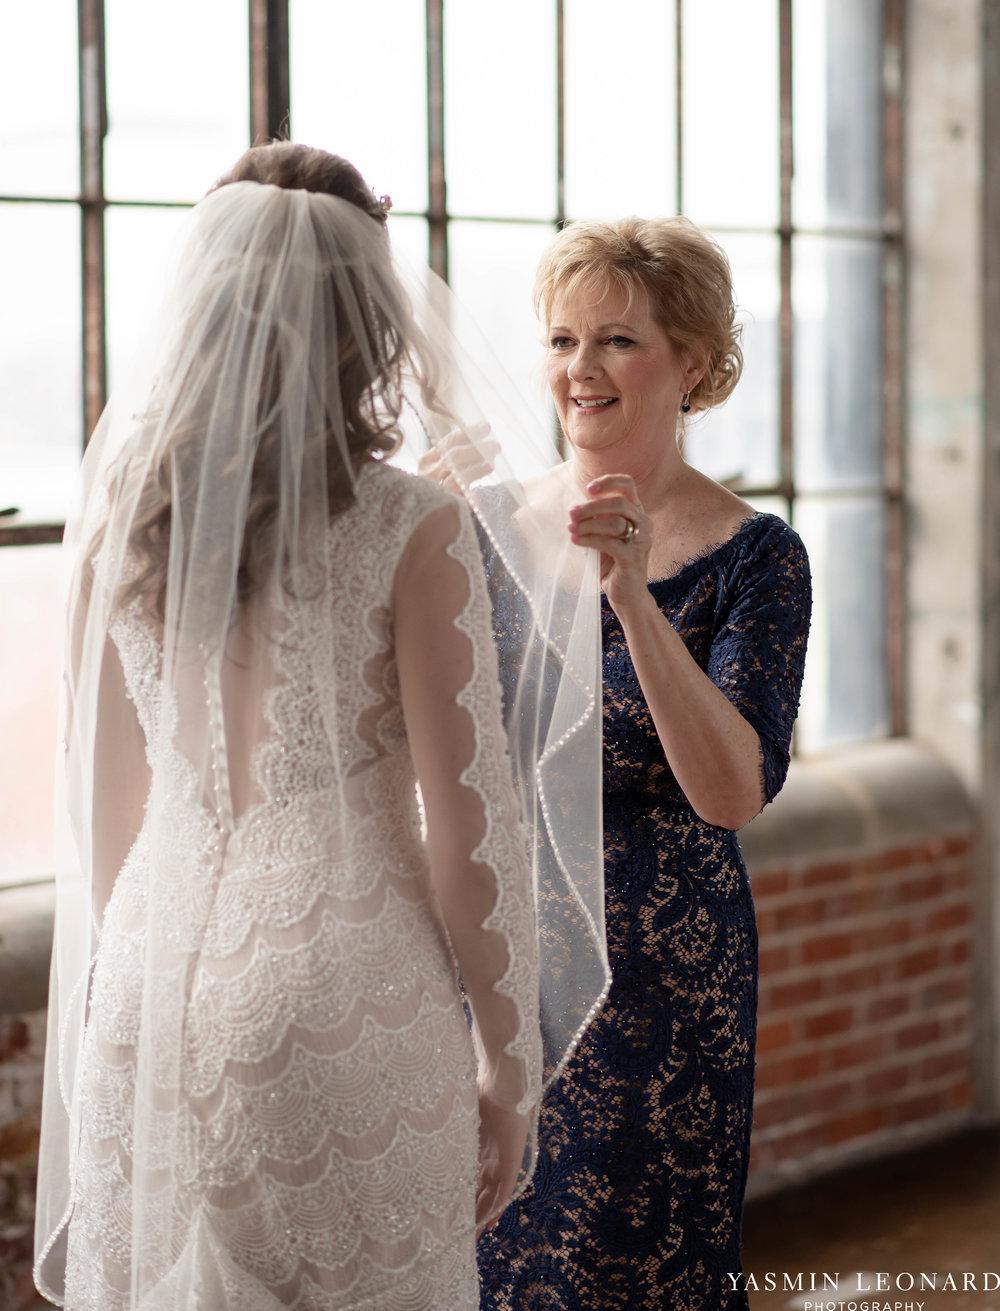 The Lofts at Union Square - Unions - High Point Weddings - NC Weddings - NC Wedding Photographer - Yasmin Leonard Photography - Just Priceless - Green Pink and Gold Wedding - Elegant Wedding-13.jpg